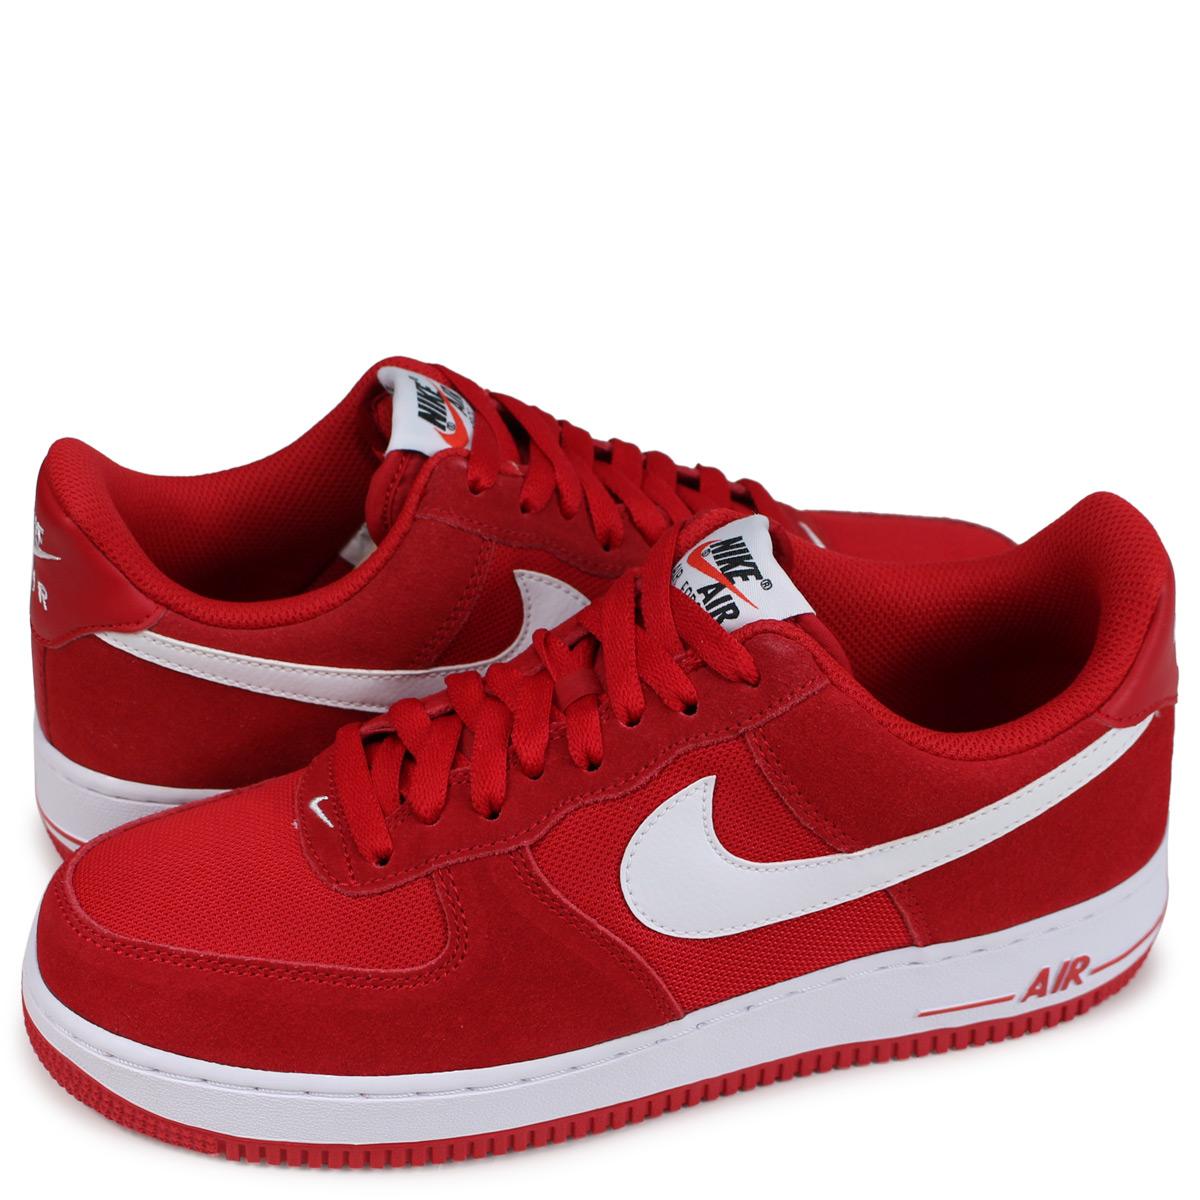 ALLSPORTS  Nike NIKE air force 1 sneakers men AIR FORCE 1 LOW red ... c57850671